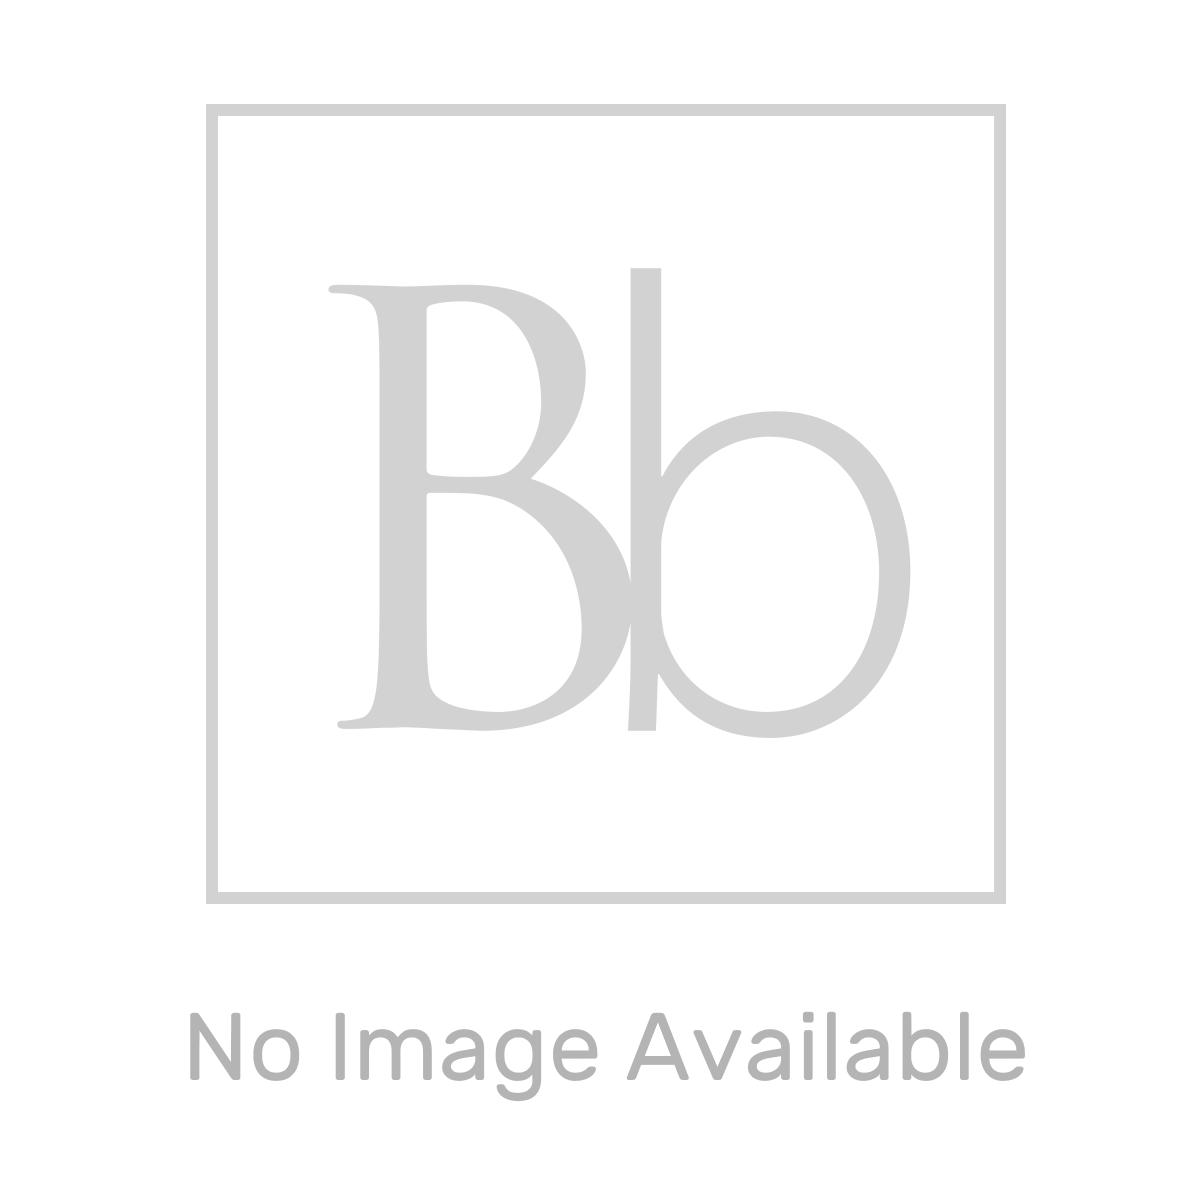 Aquadart White Slate Shower Tray 1400 x 900